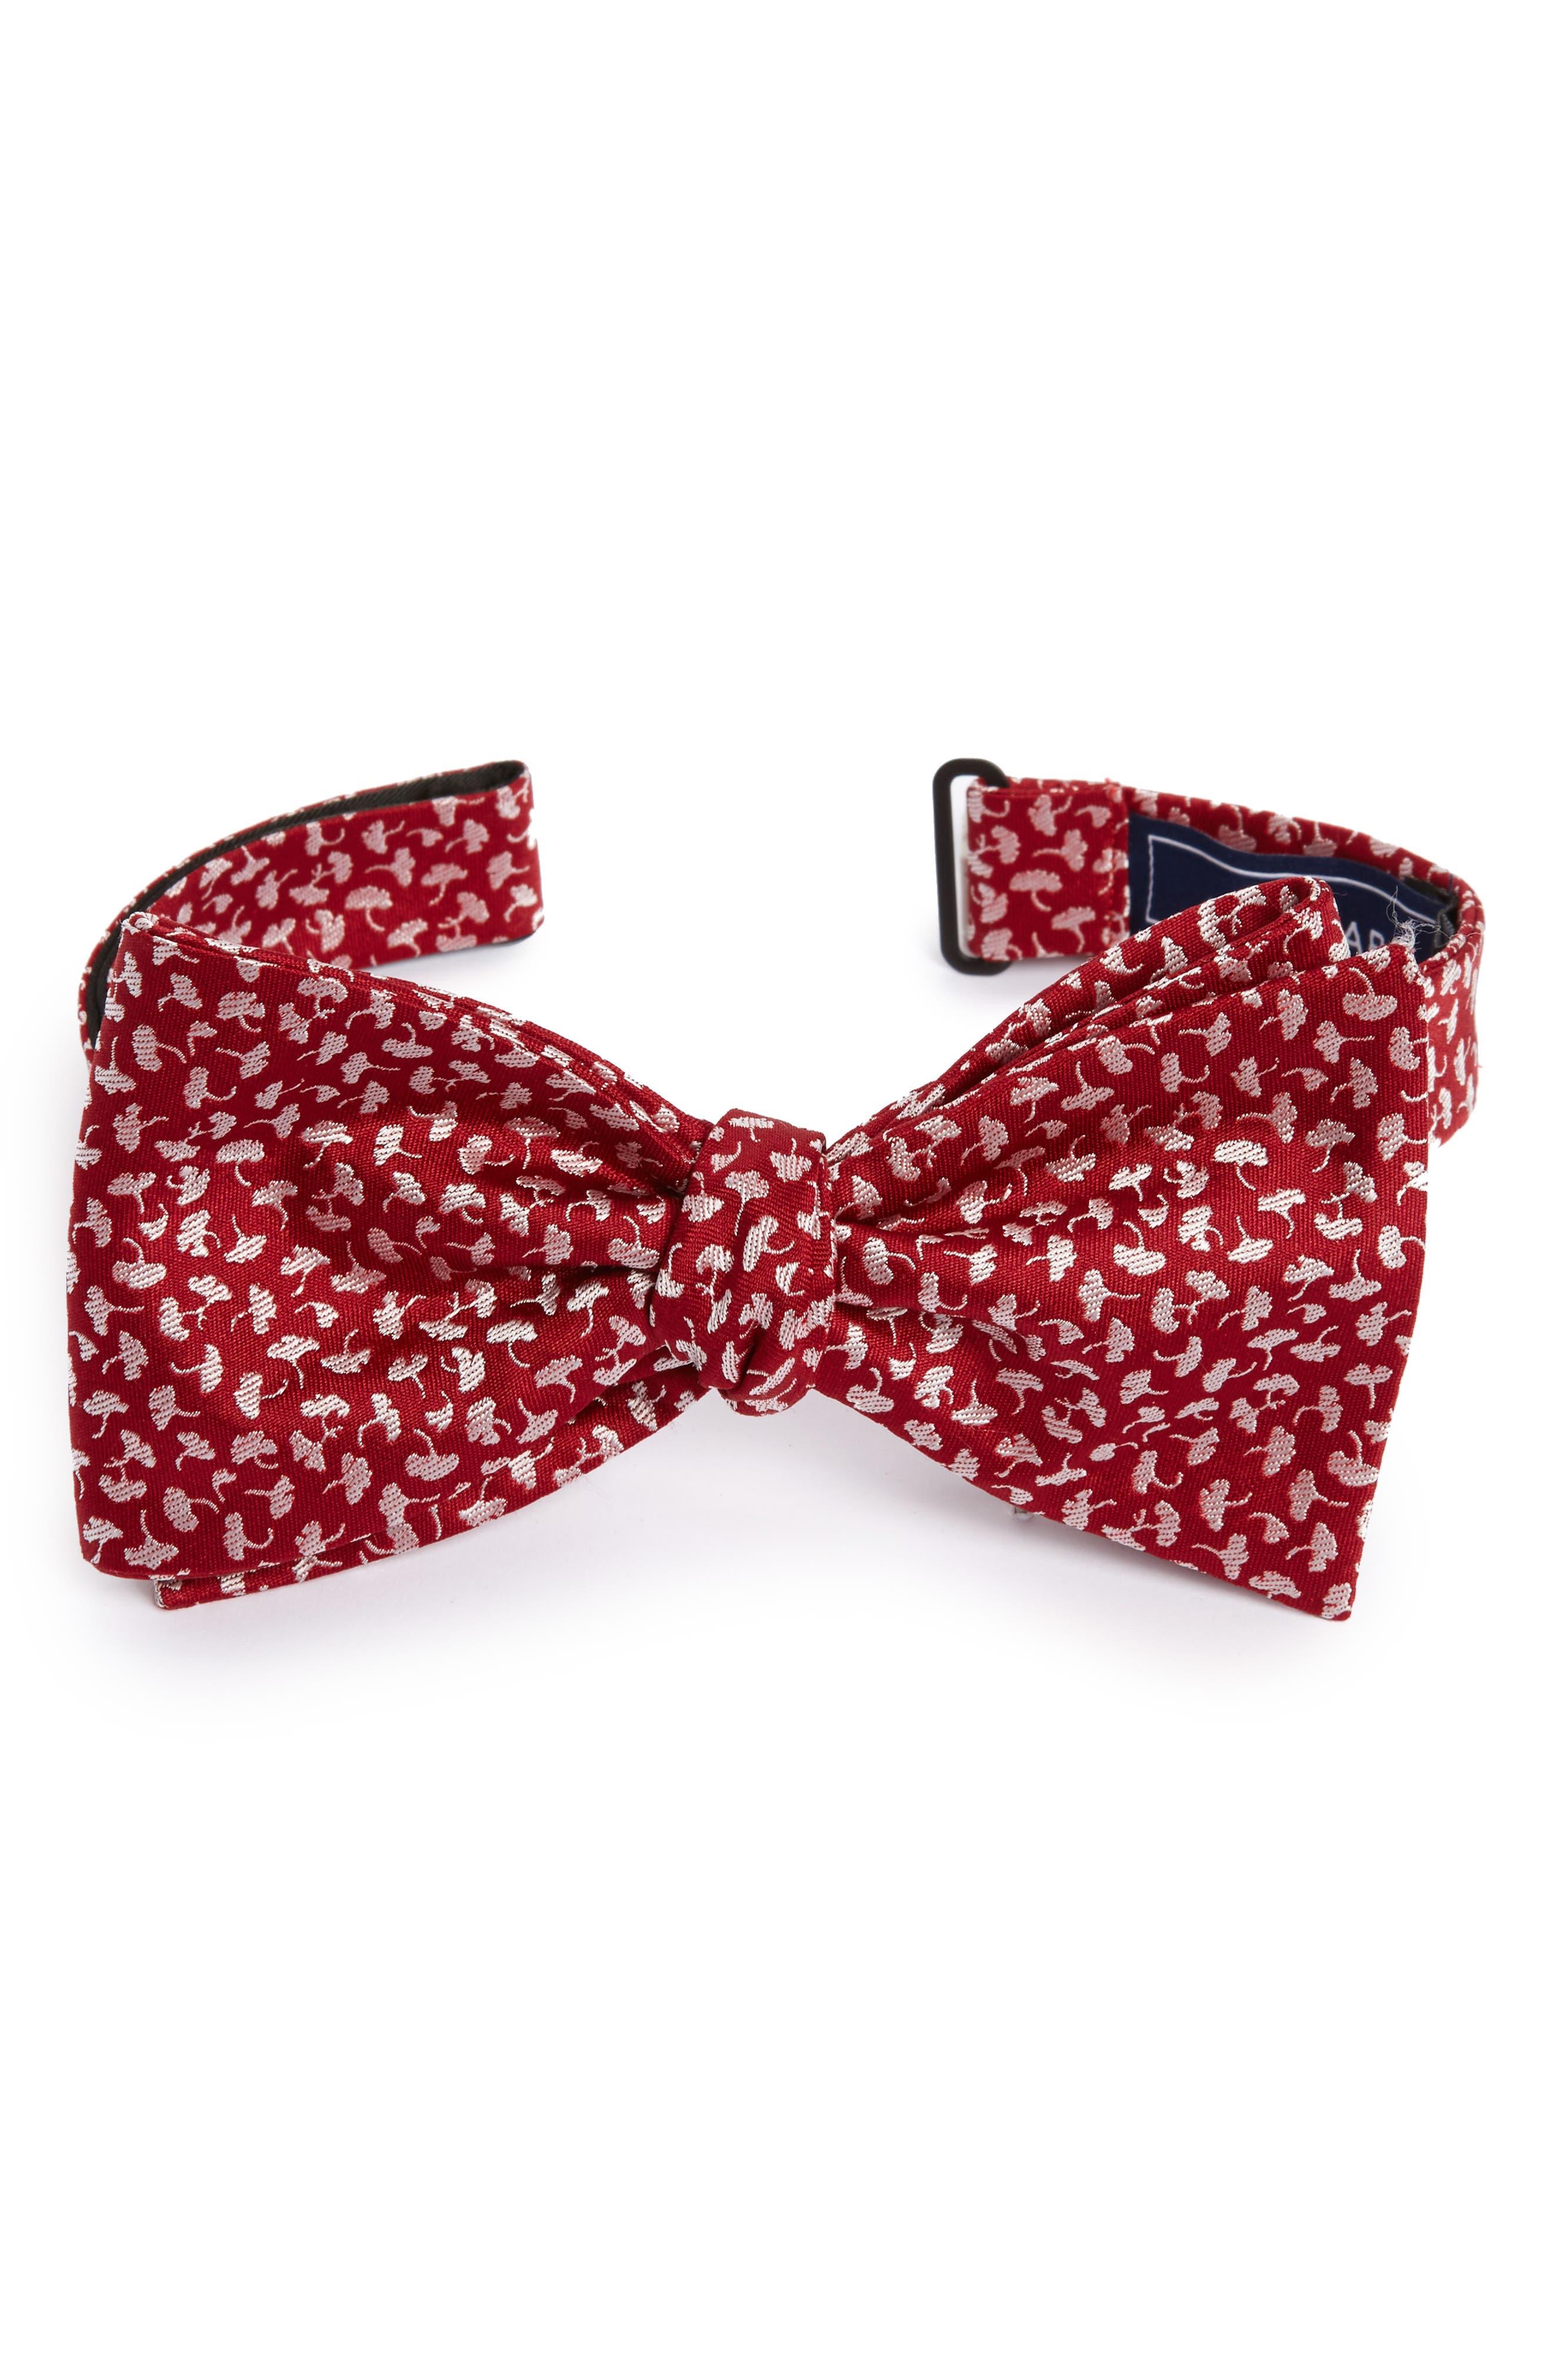 True Floral Silk Bow Tie,                         Main,                         color, Red